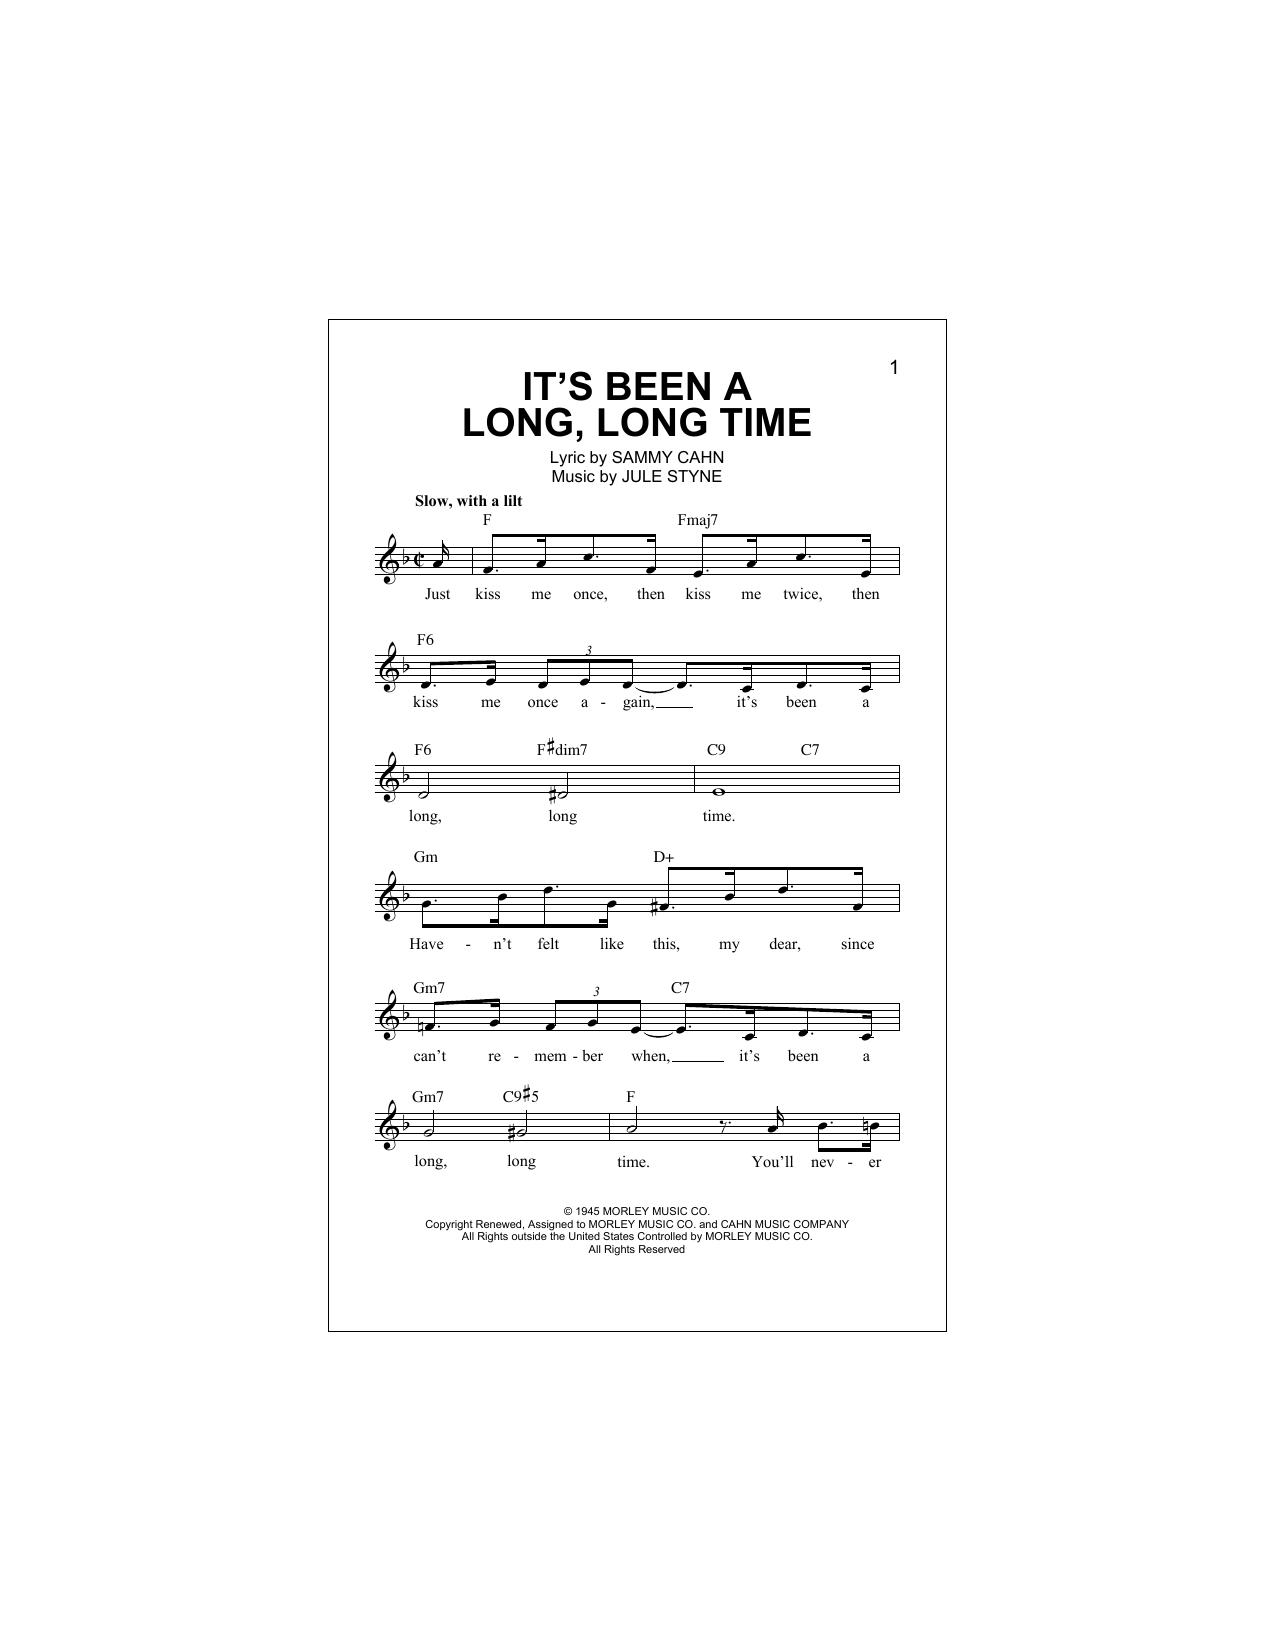 Sheet Music Digital Files To Print - Licensed Standards Digital ...